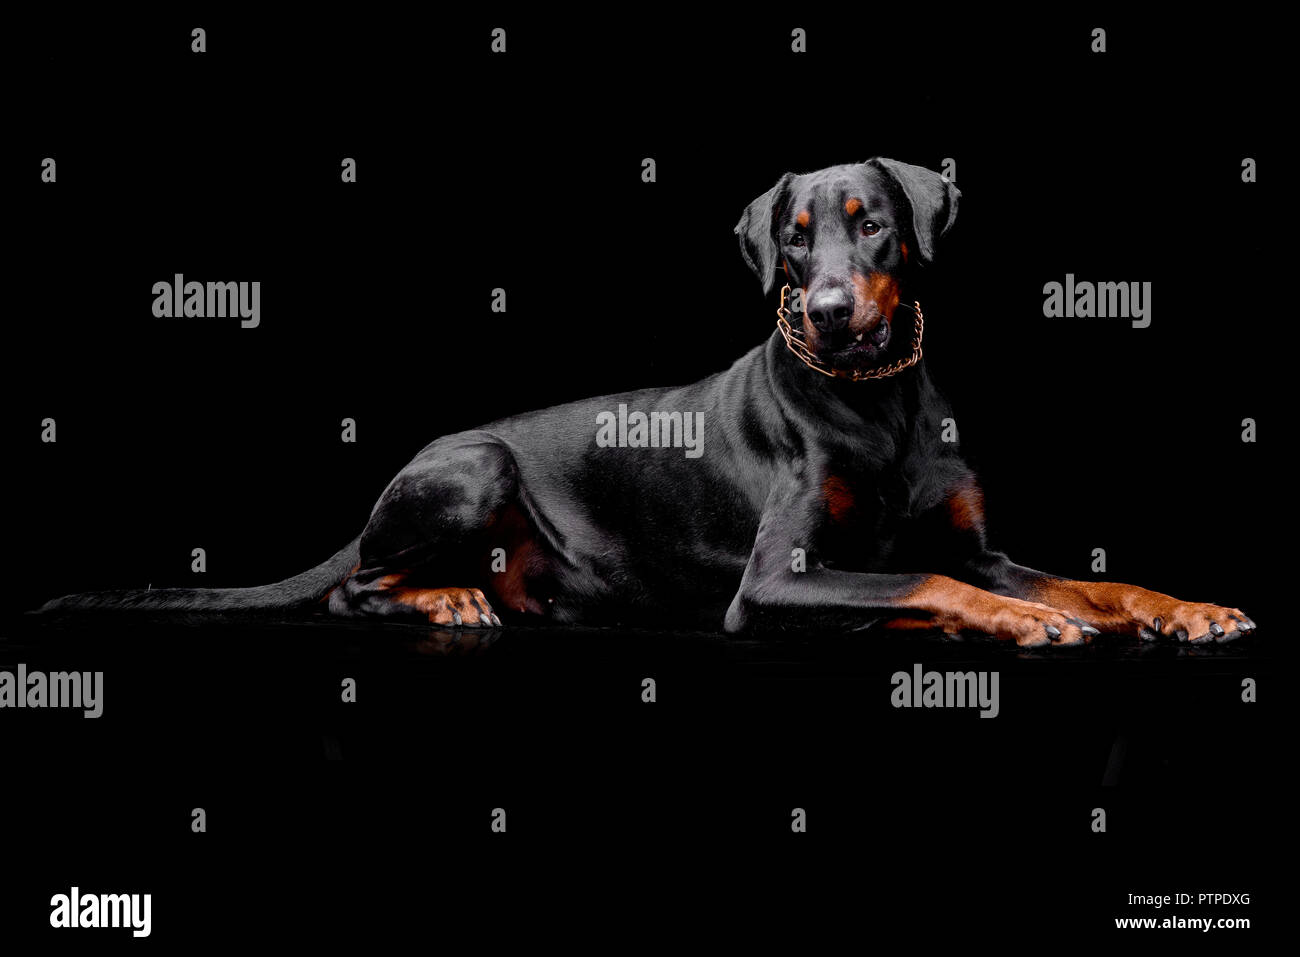 Studio shot of an adorable Dobermann lying on black background. - Stock Image